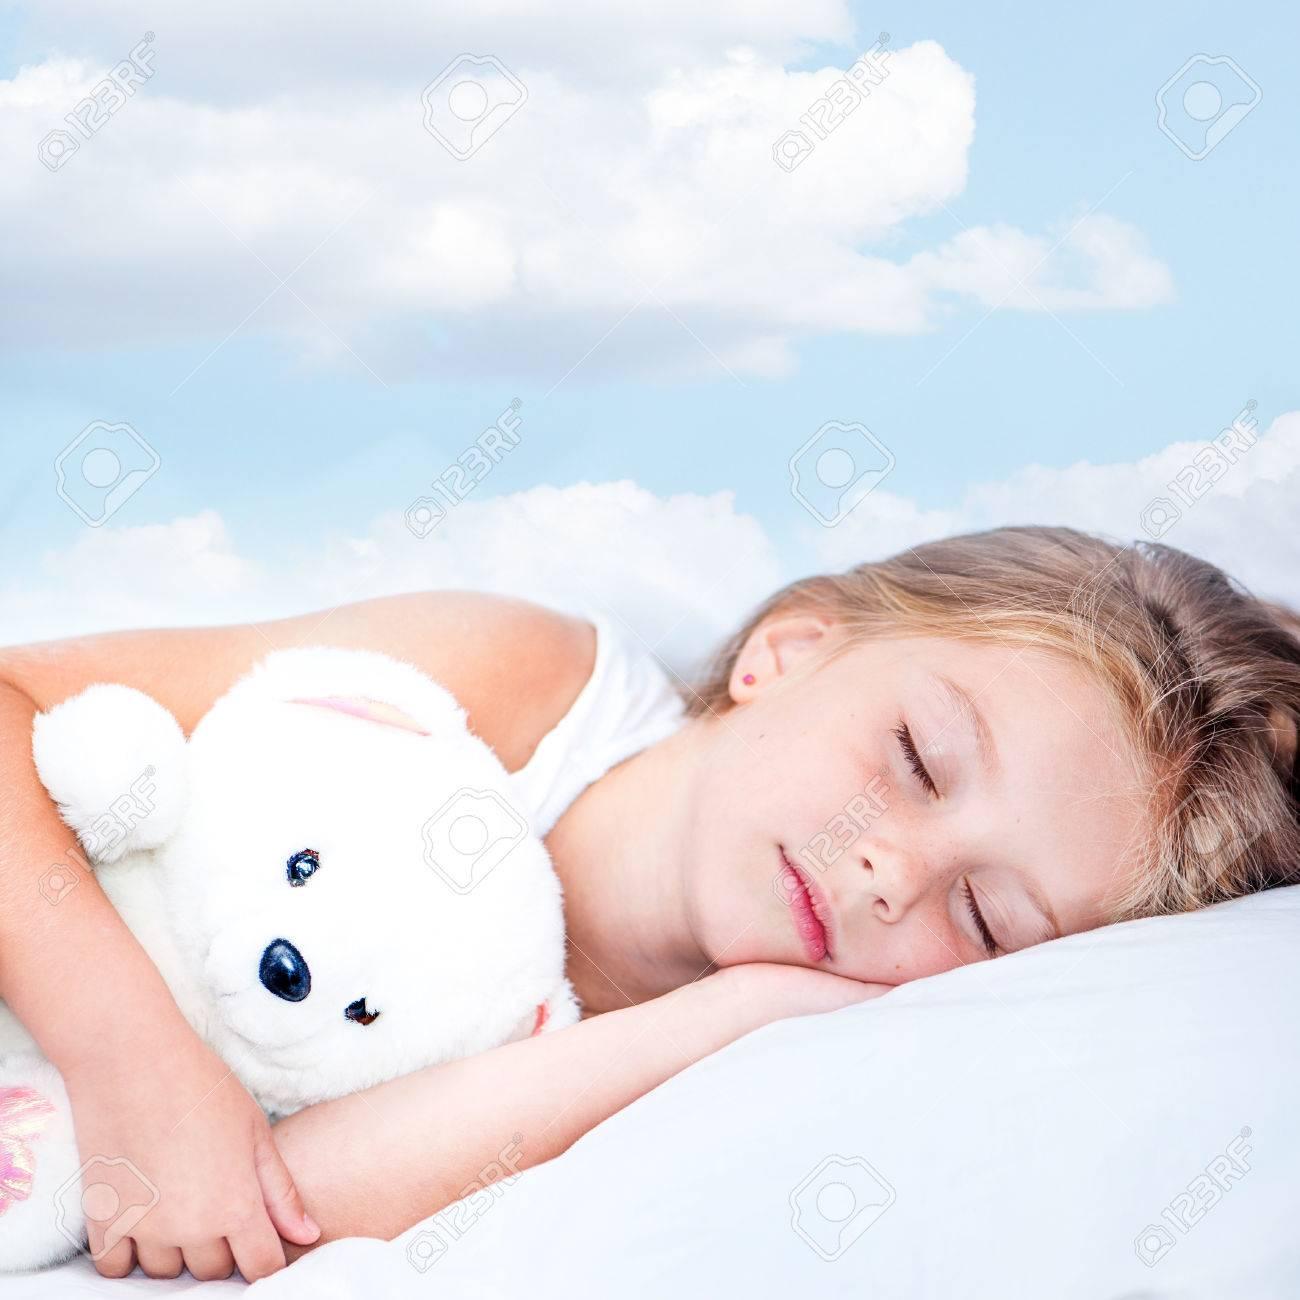 Little Girl Sleeping Night Stock Photos & Little Girl Sleeping ...